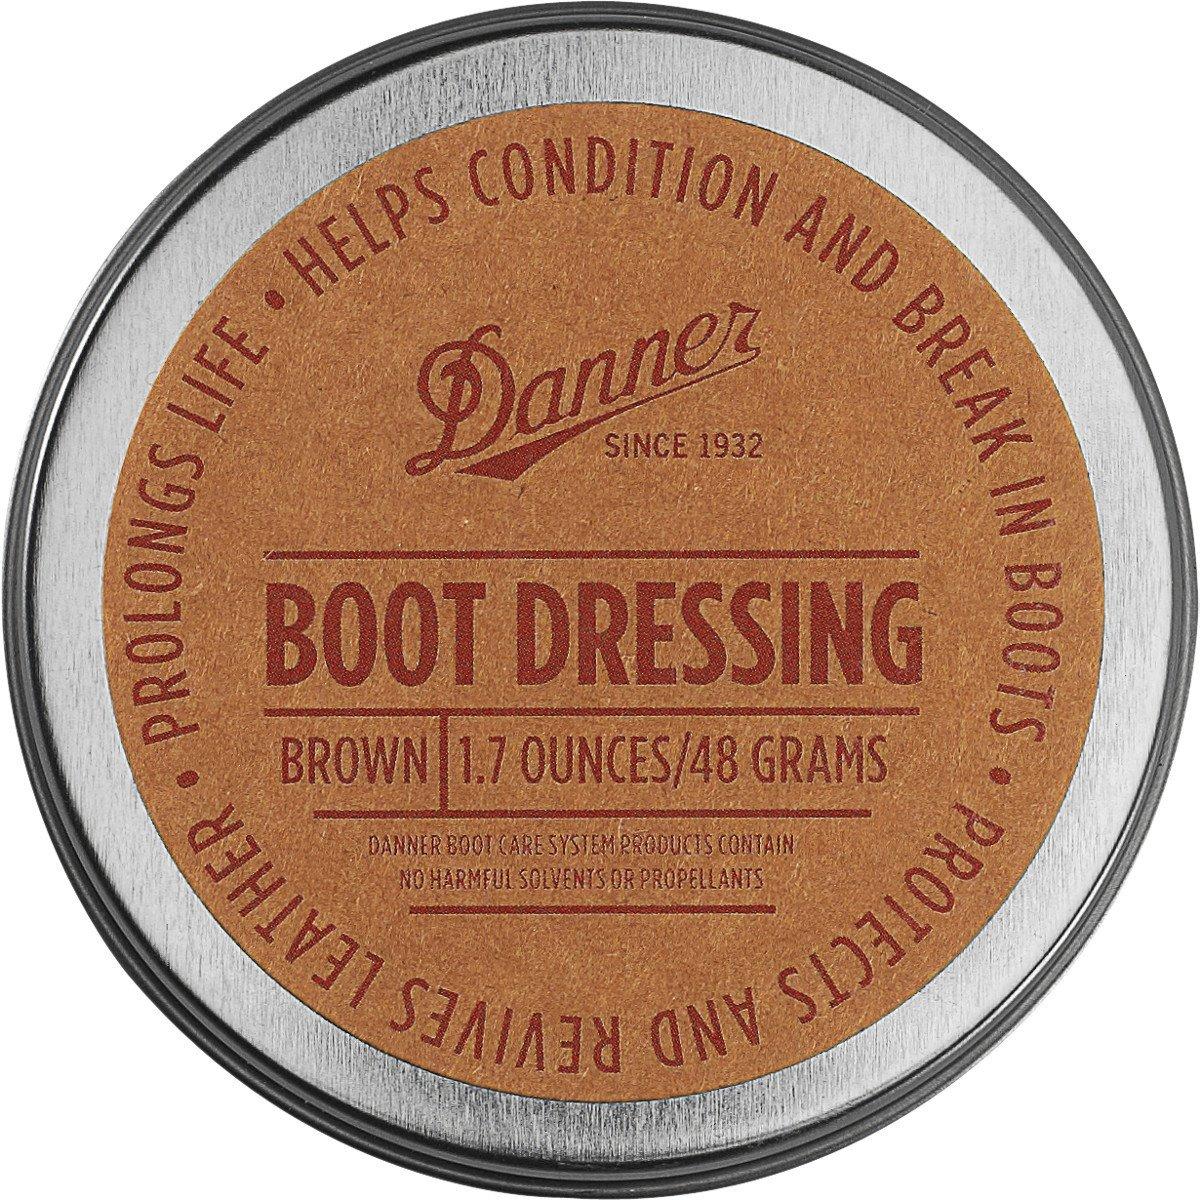 Danner Boot Dressing 1.7 Oz Shoe Care Product, Brown, Universal Regular US